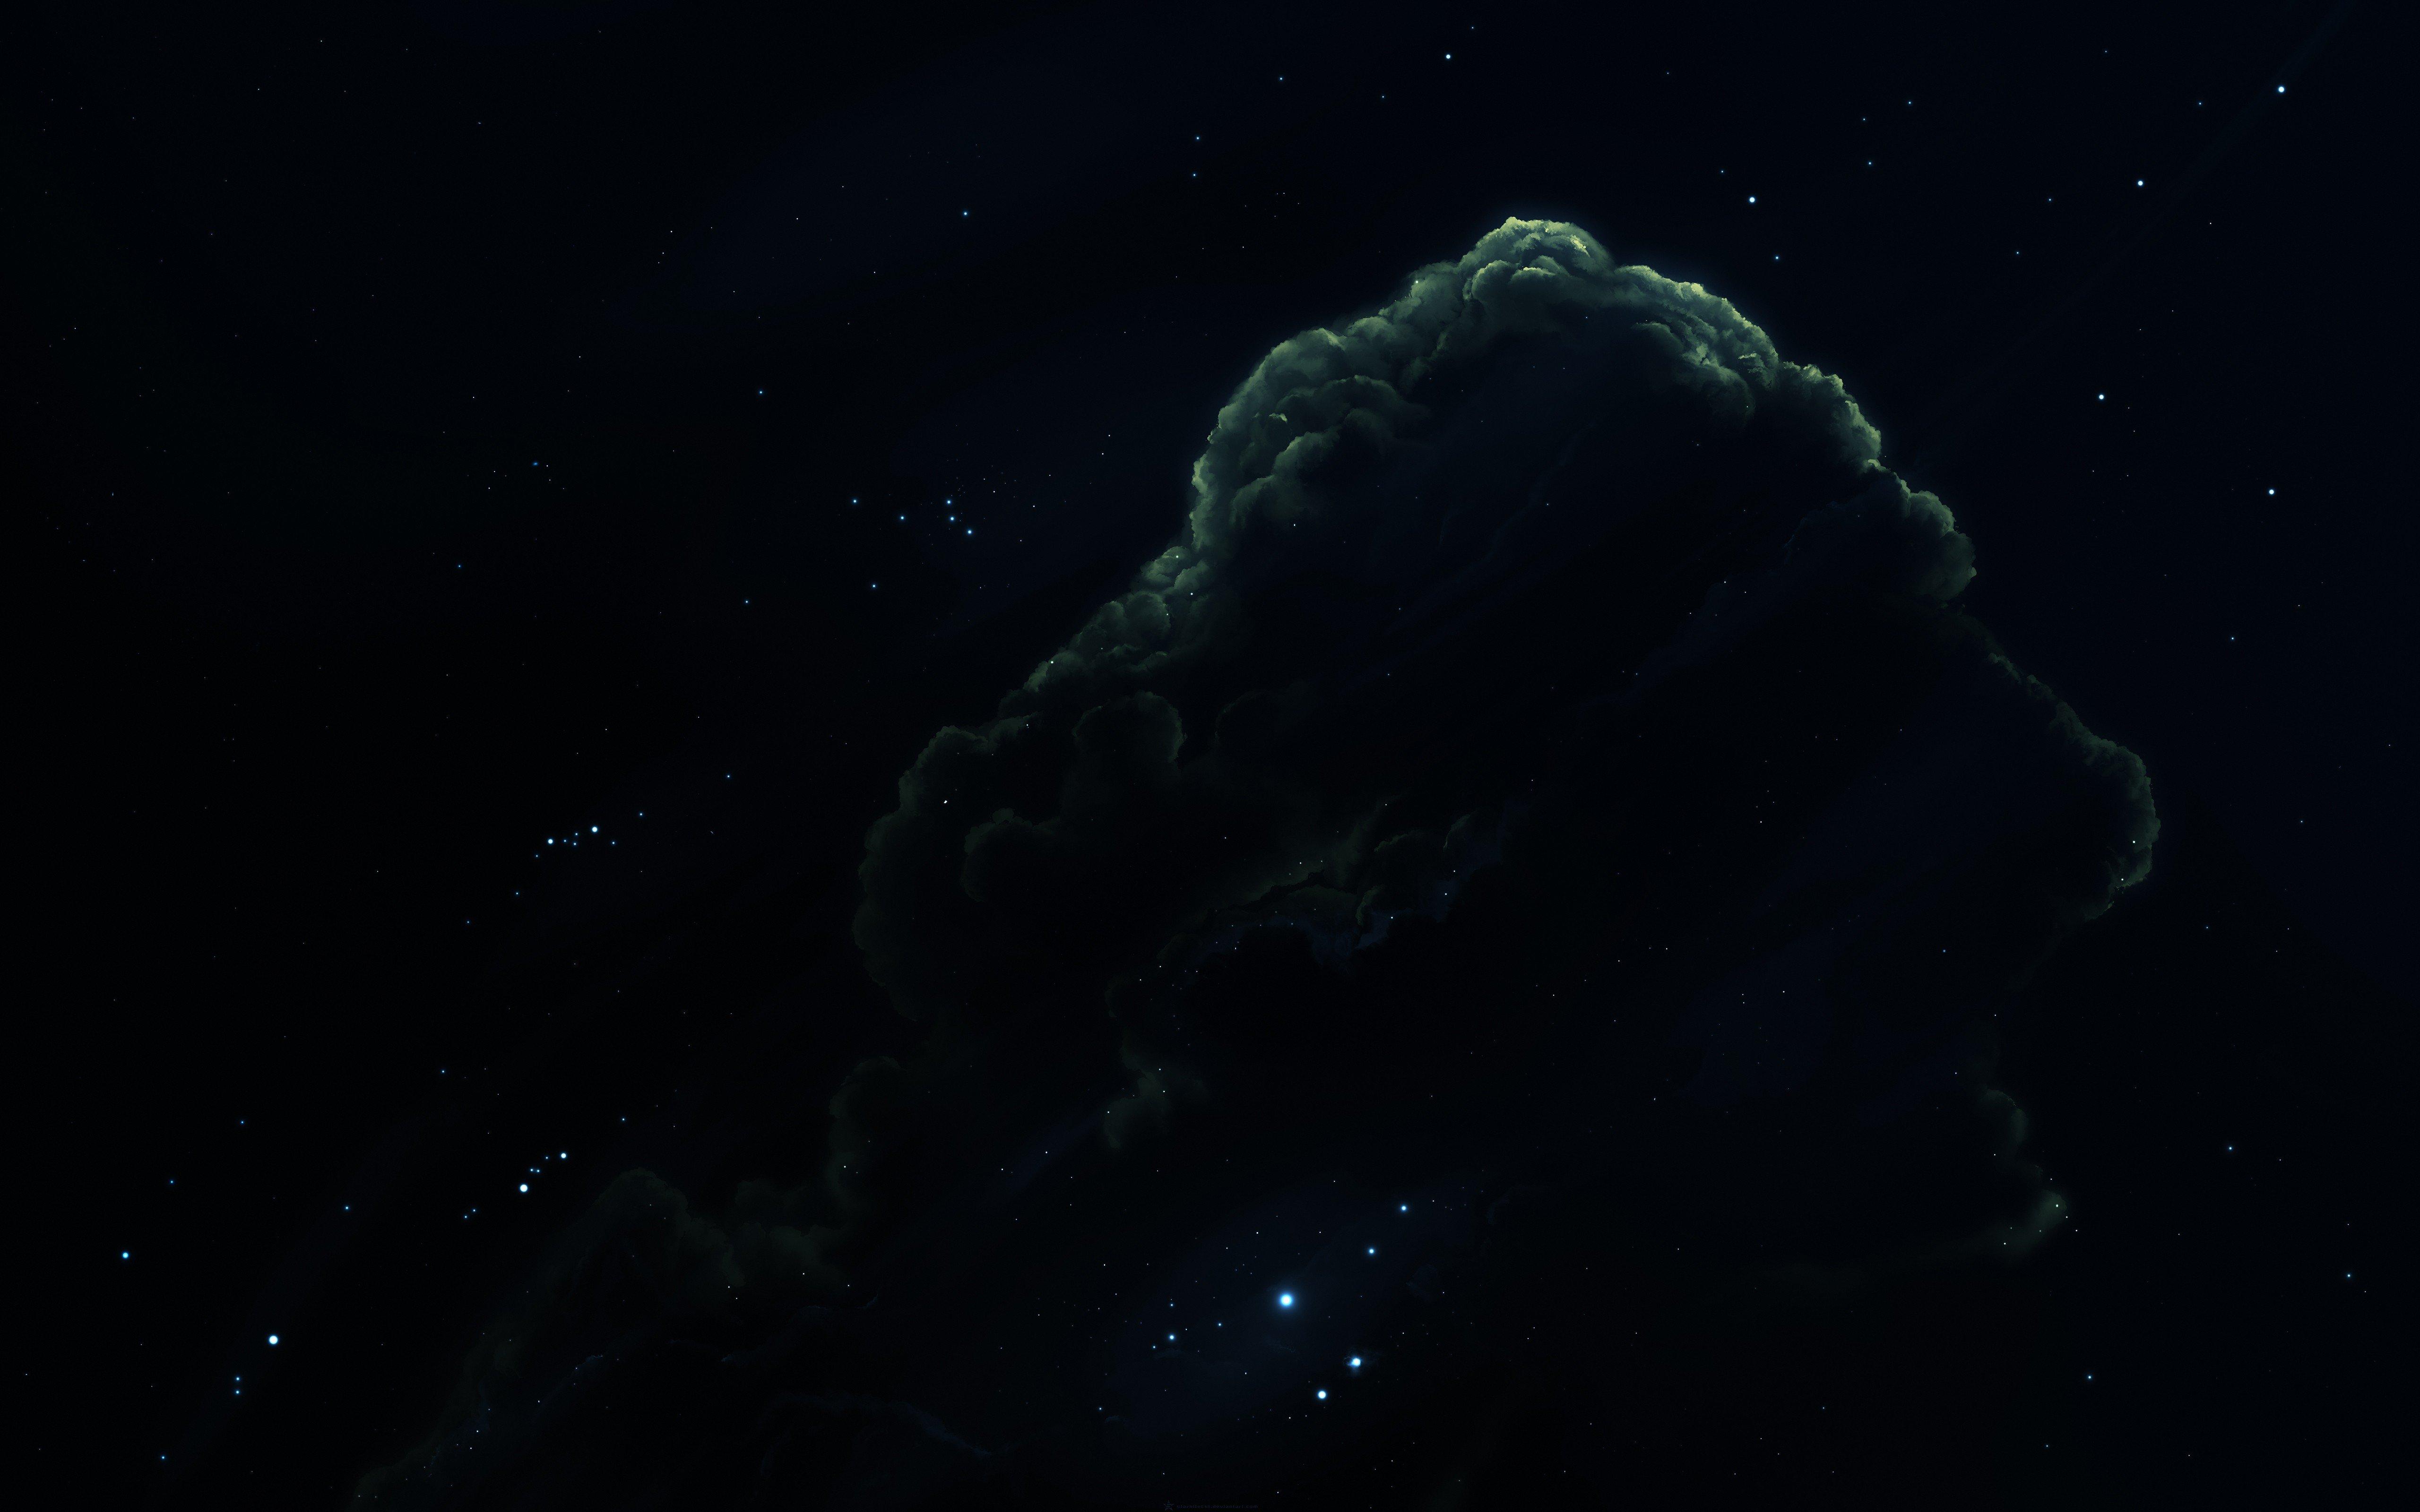 space art, Nebula, Space, Stars, Digital art Wallpaper